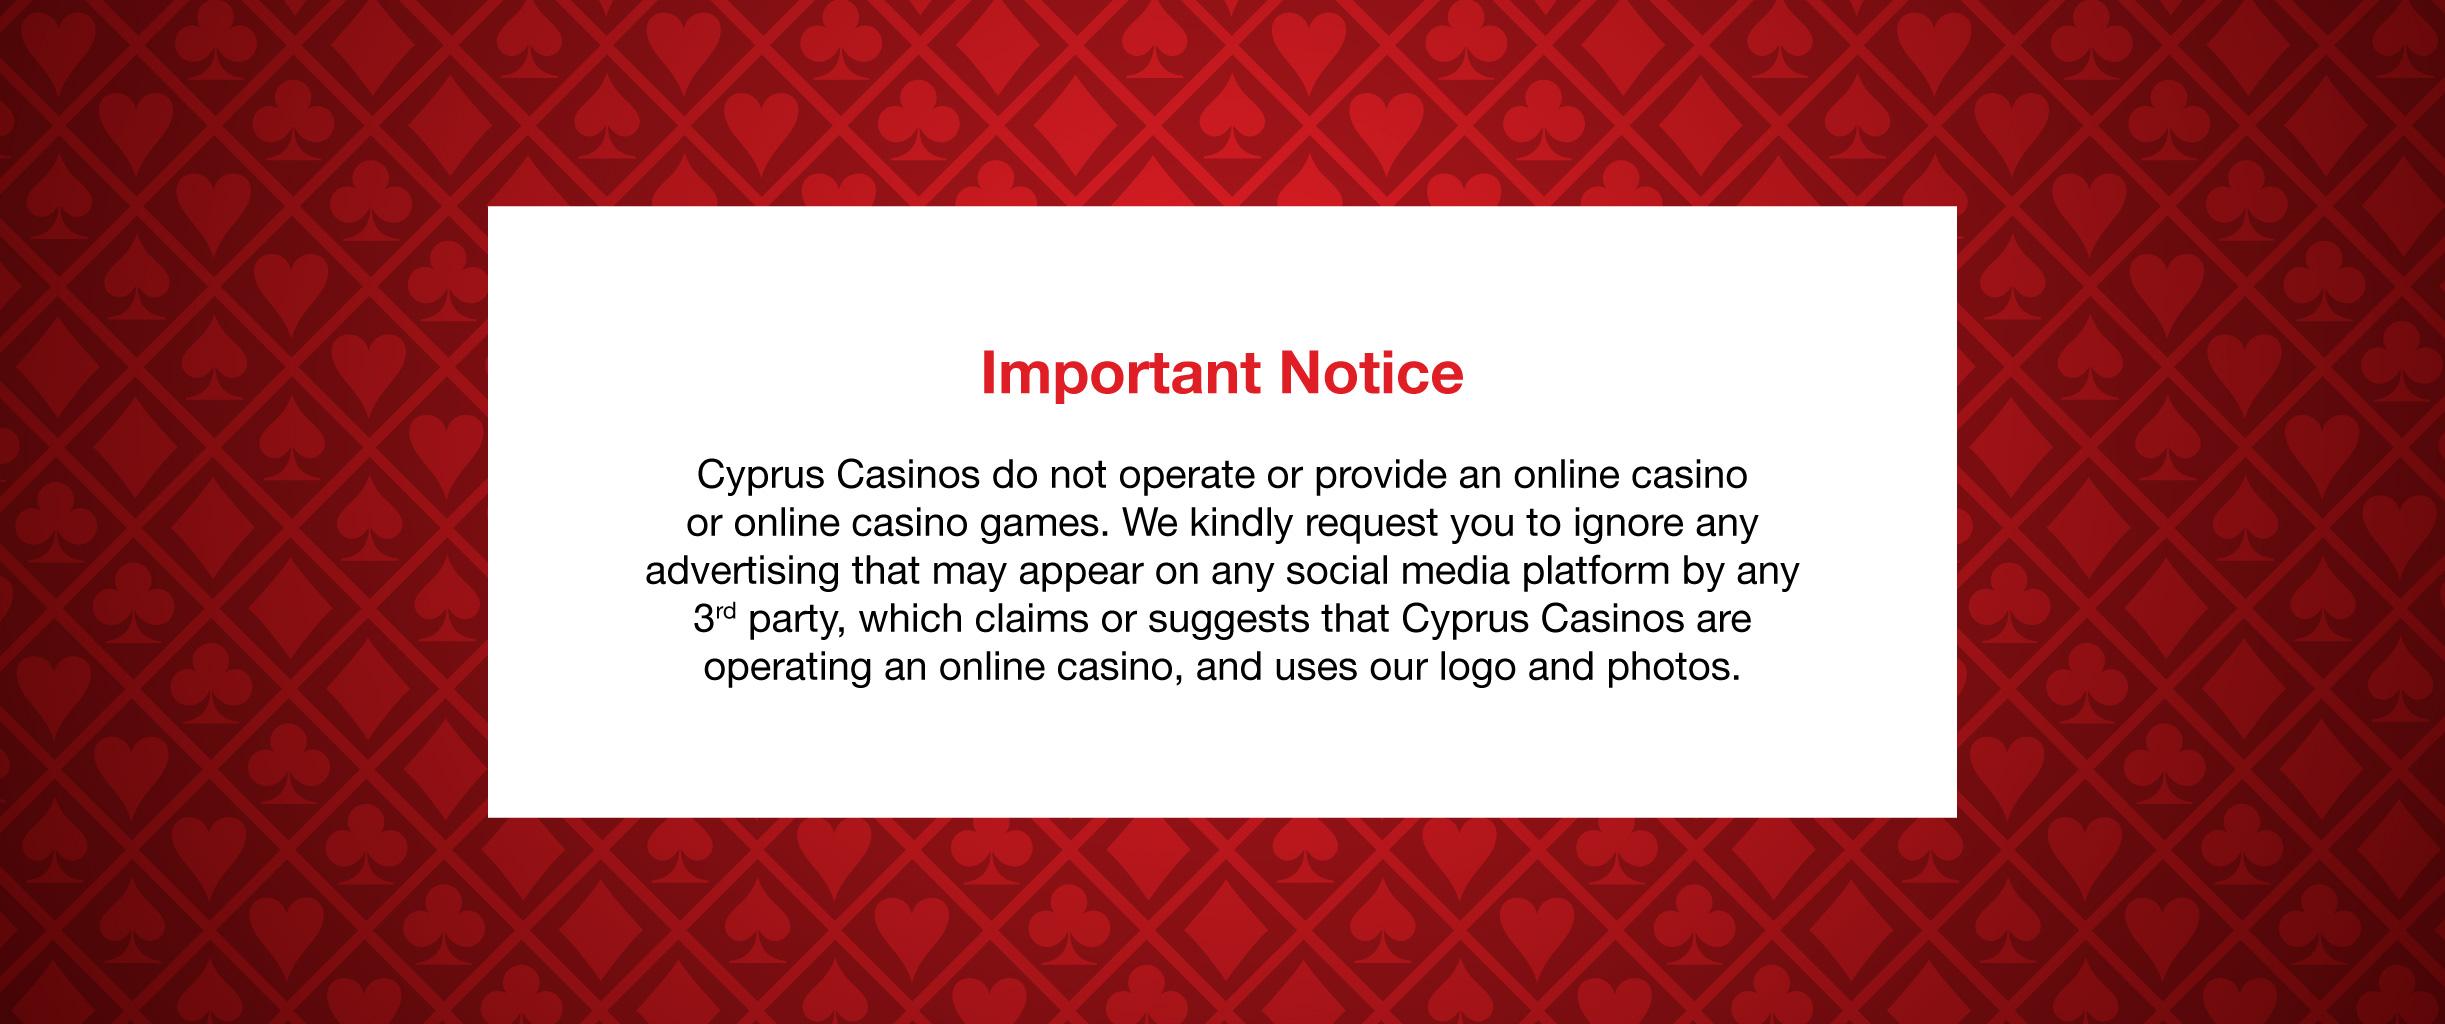 Cyprus Casinos| World-class casino gaming